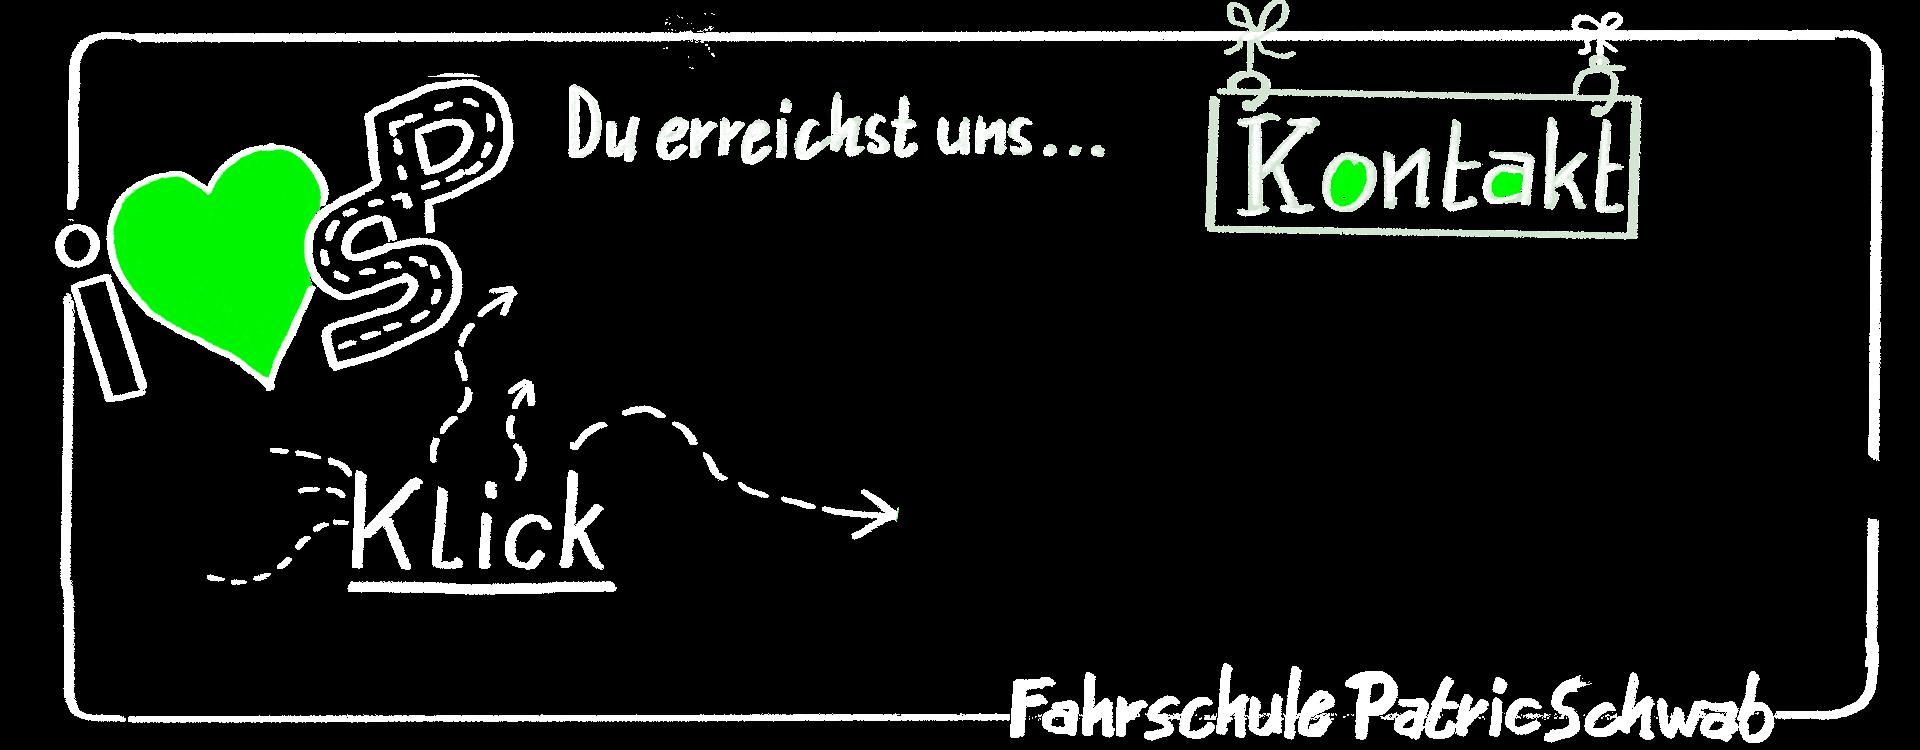 Fahrschule Patric Schwab